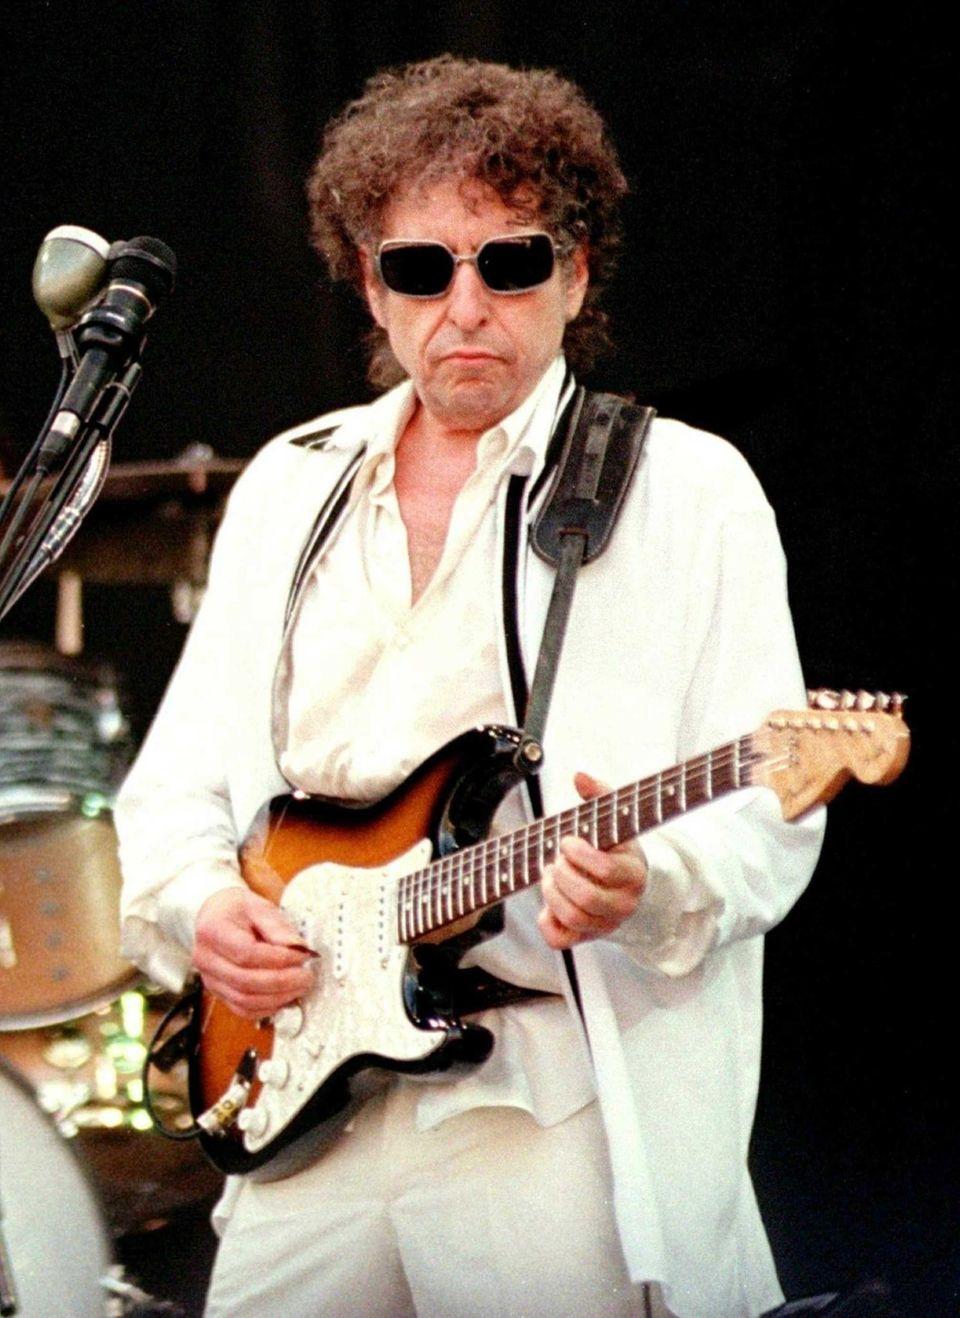 Bob Dylan performs July 11, 1998, at a